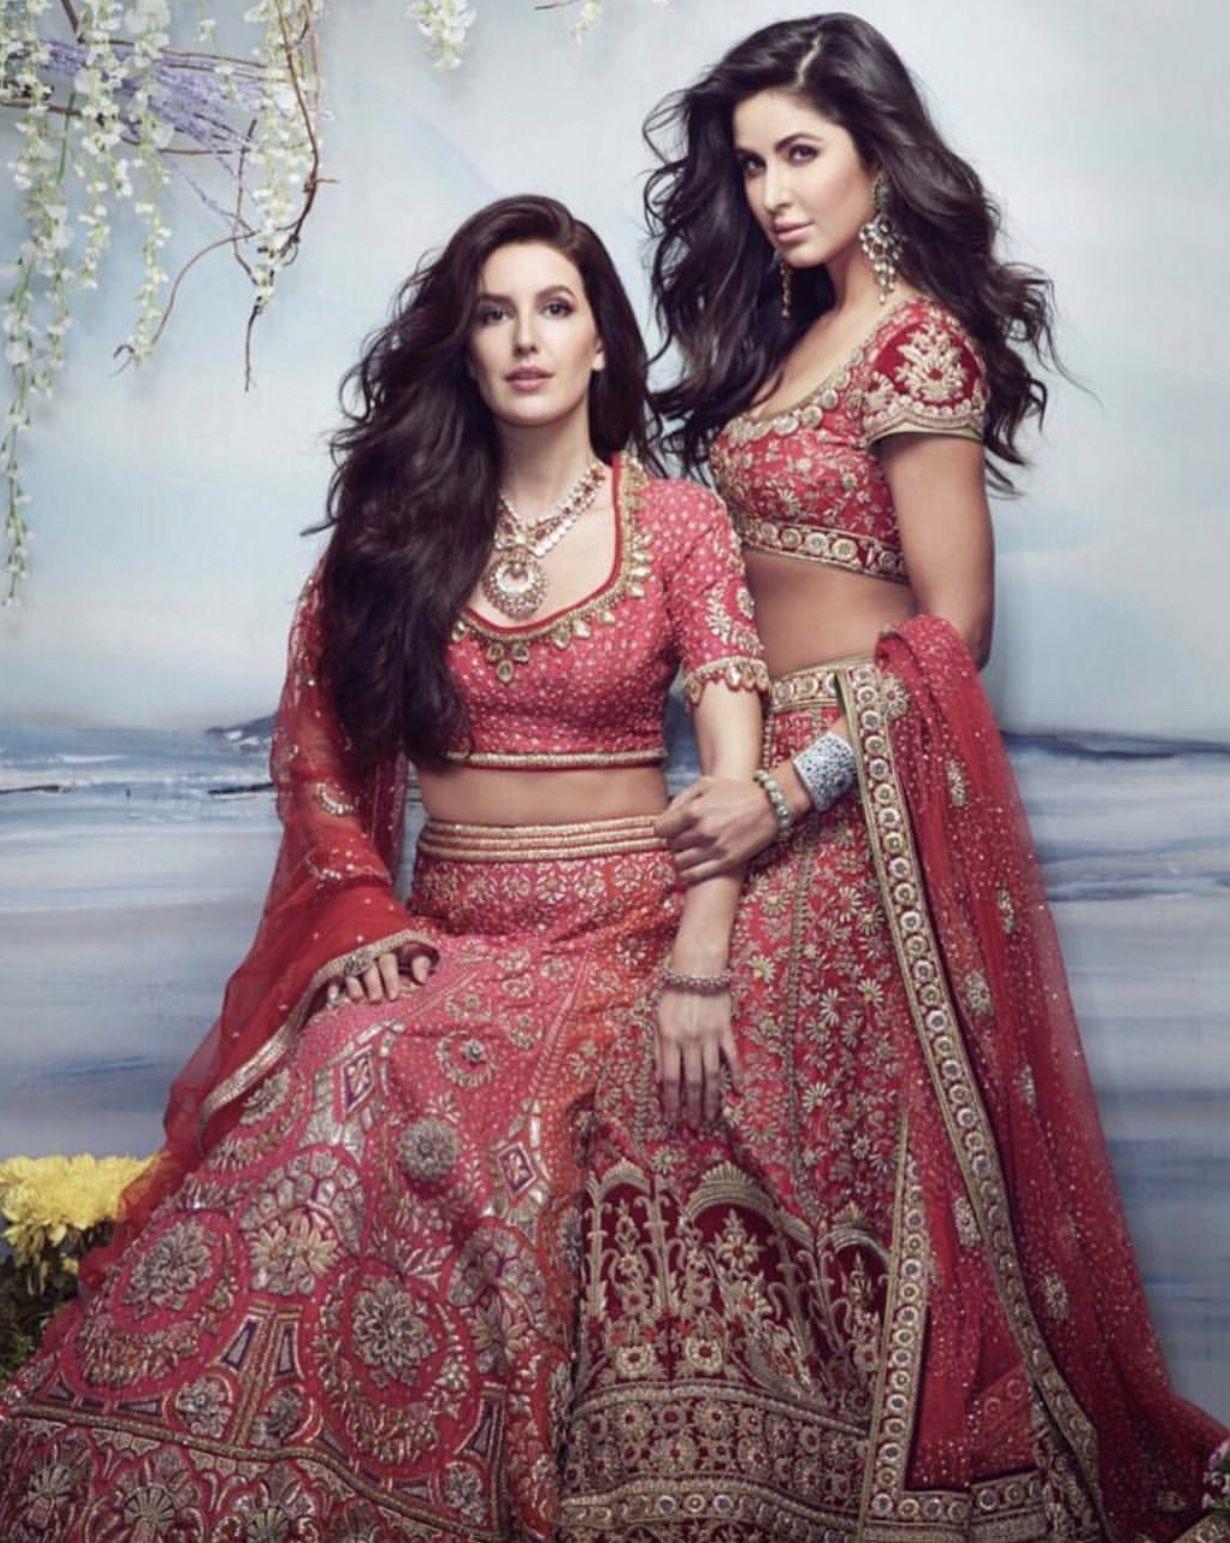 The Gorgeous Katrina Kaif And Sister Isabelle In Tarun Tahiliani Bridal Lehenga Designs For Brides Today Katrina Kaif Katrina Kaif Photo Bollywood Celebrities